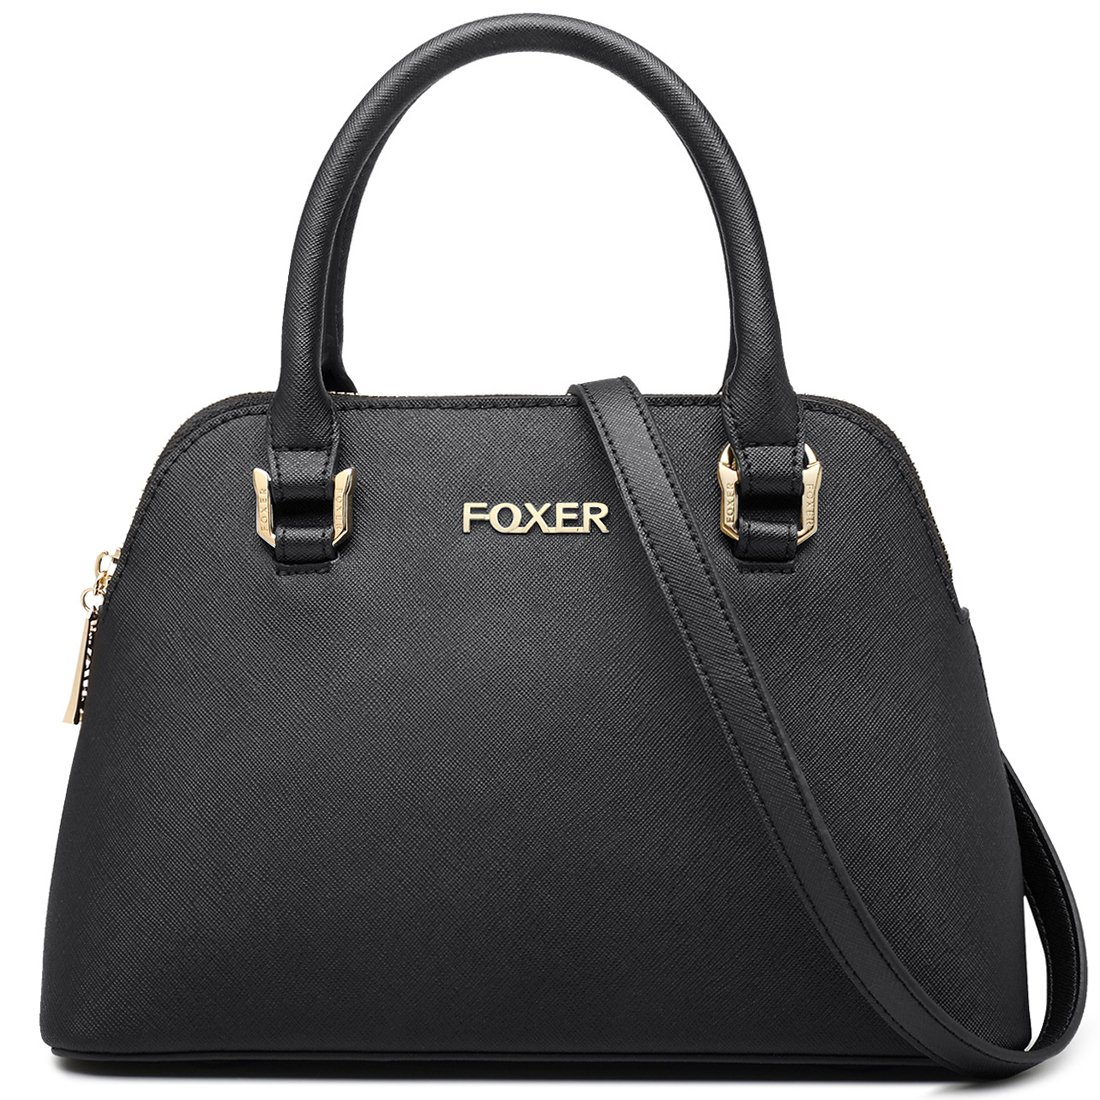 70f84f2aed FOXER Women Handbag Leather Purse Top Handle Cow Leather Shoulder Tote Bag  (Black)  Handbags  Amazon.com